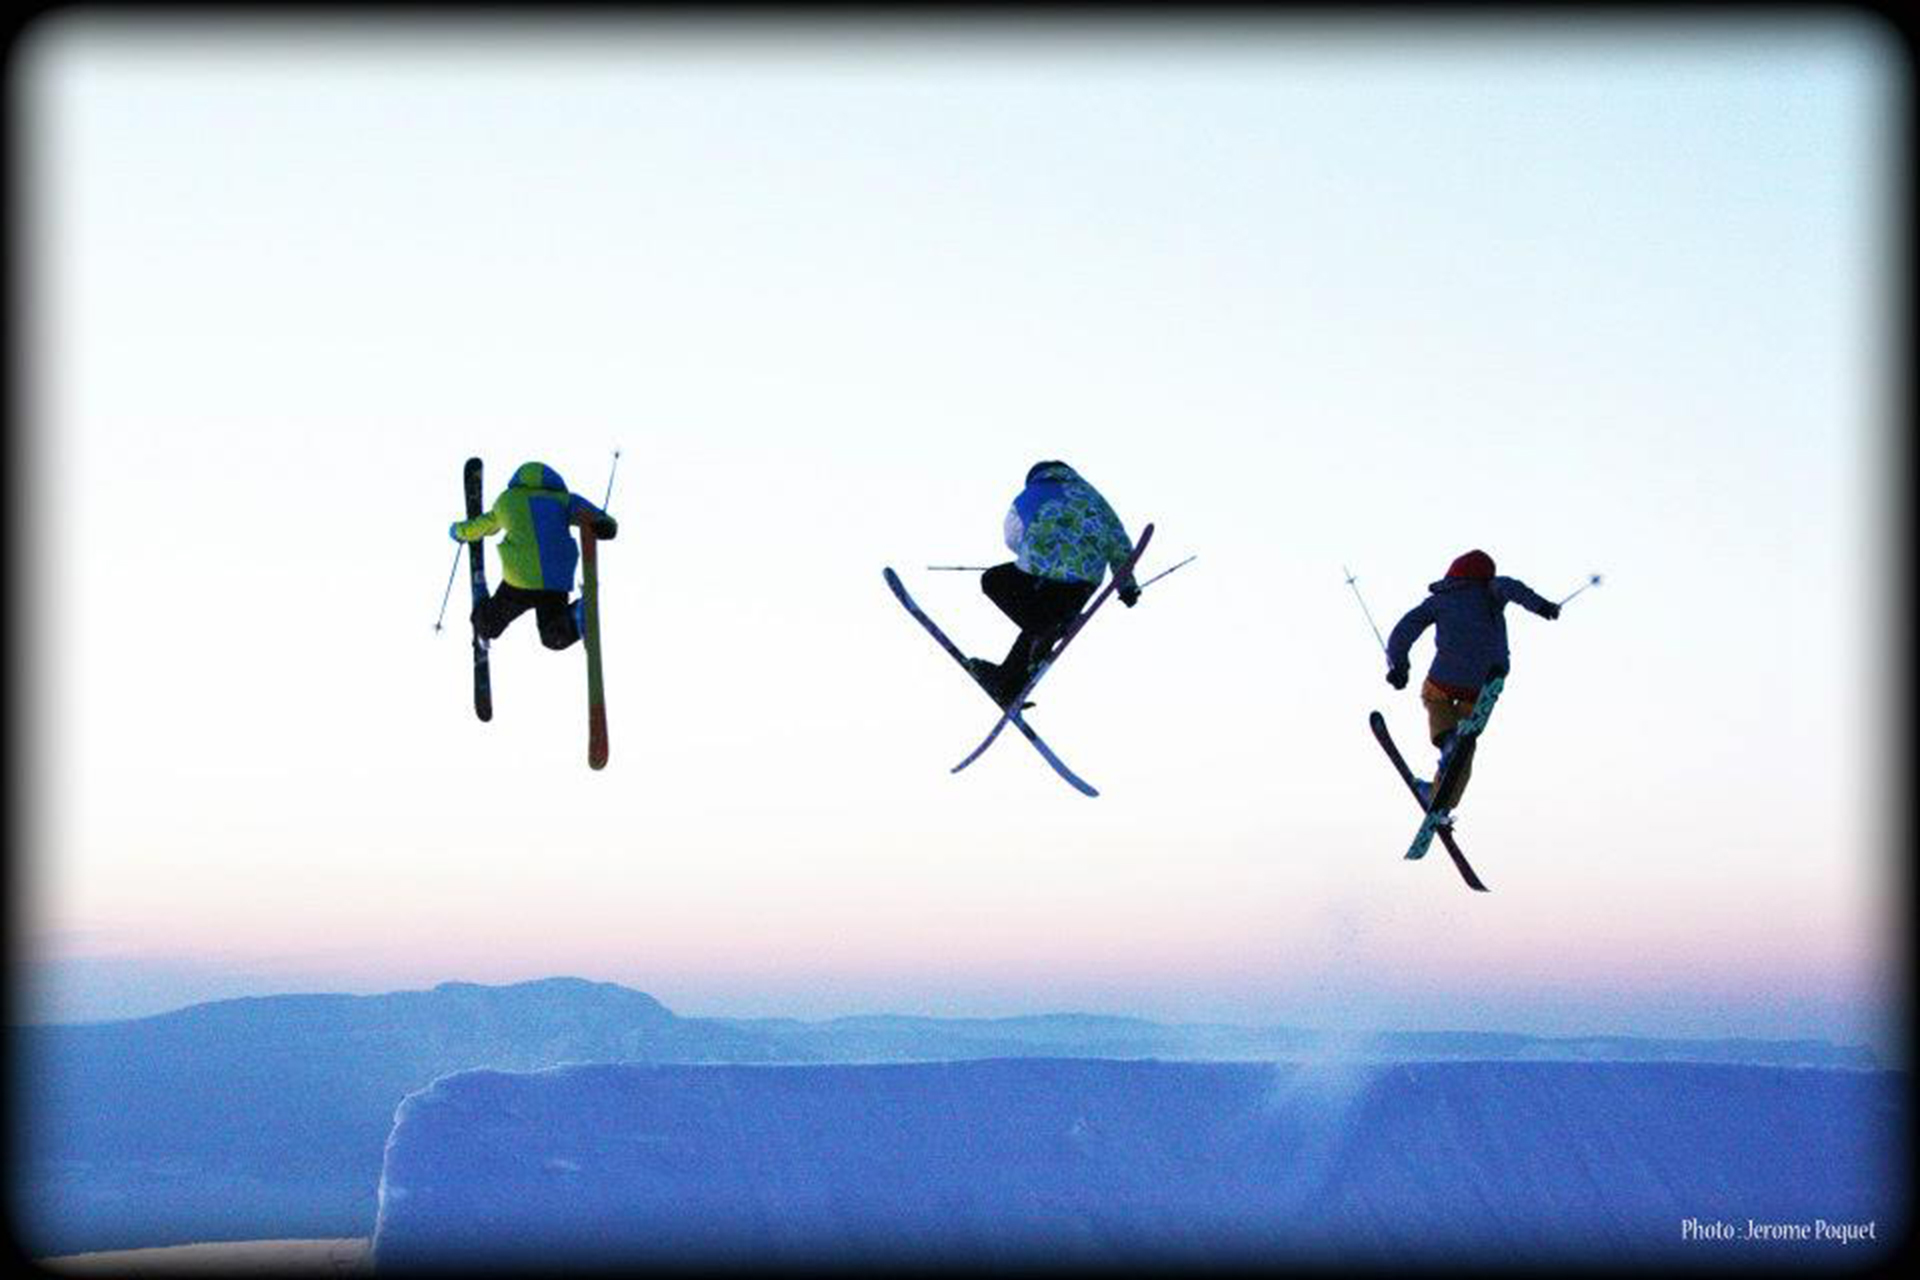 Chamrousse champion mirco ferrari ski freestyle station montagne ski isère france - © Jérome Poquet